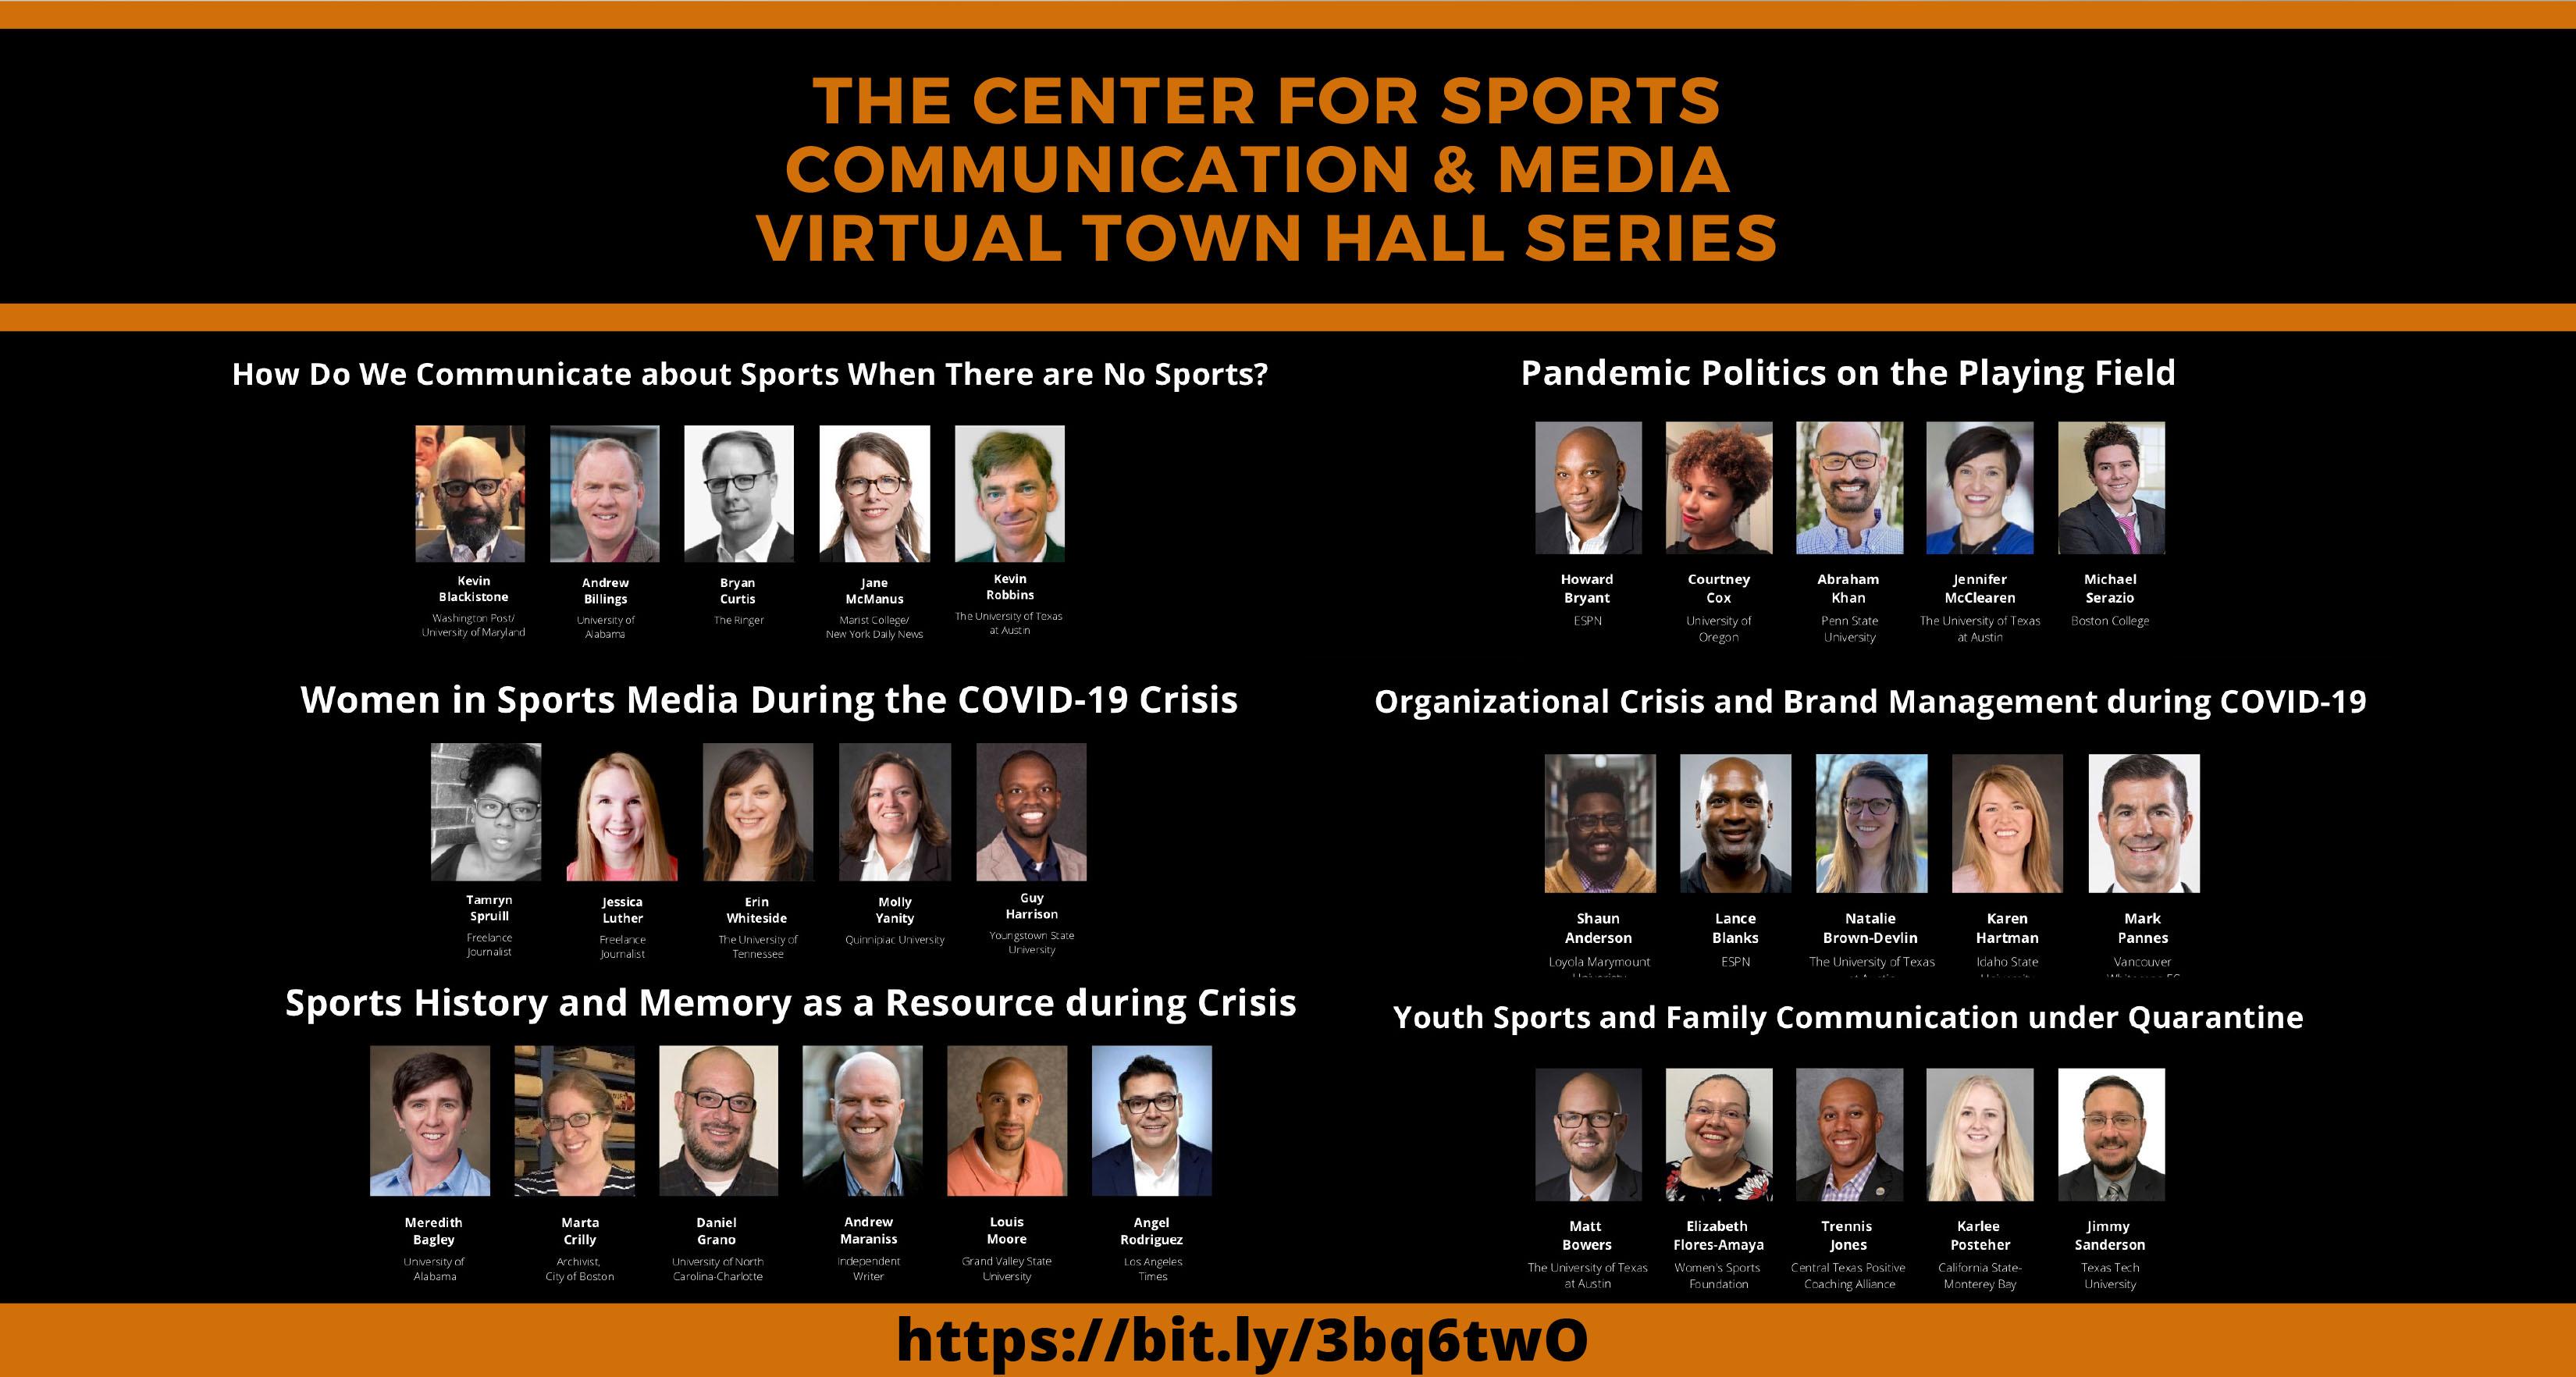 virtual town hall series summary